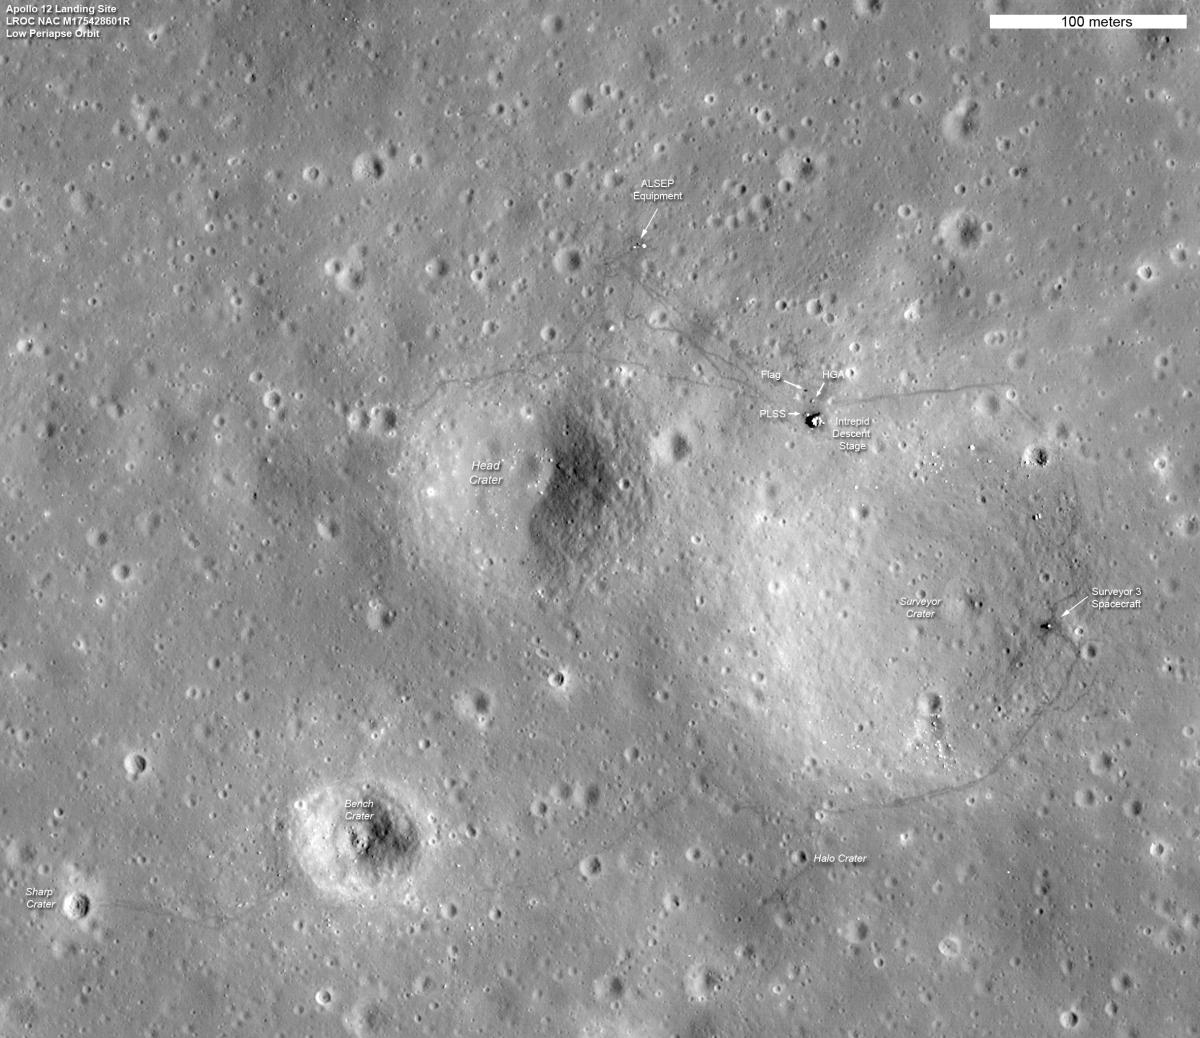 moon landing sites - photo #21